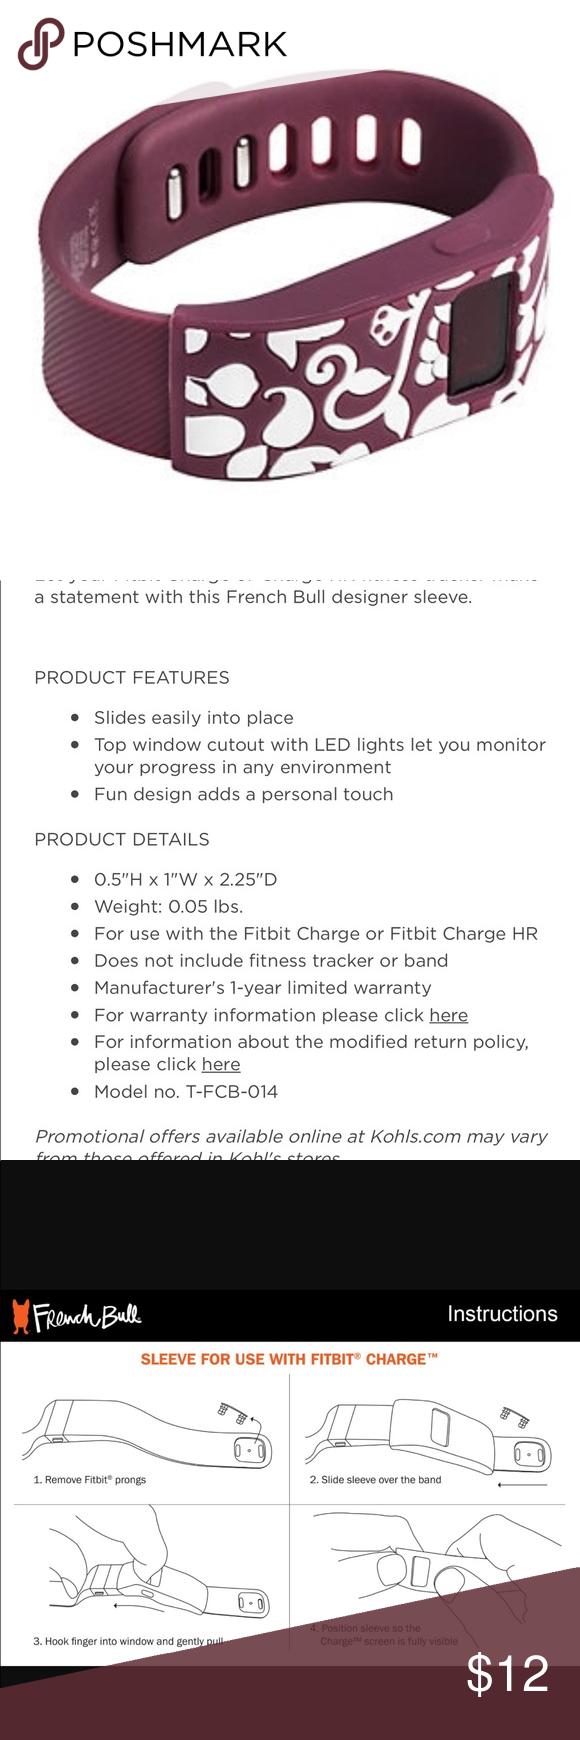 French Bull Designer Bumper For Fitbit Nwt My Posh Picks